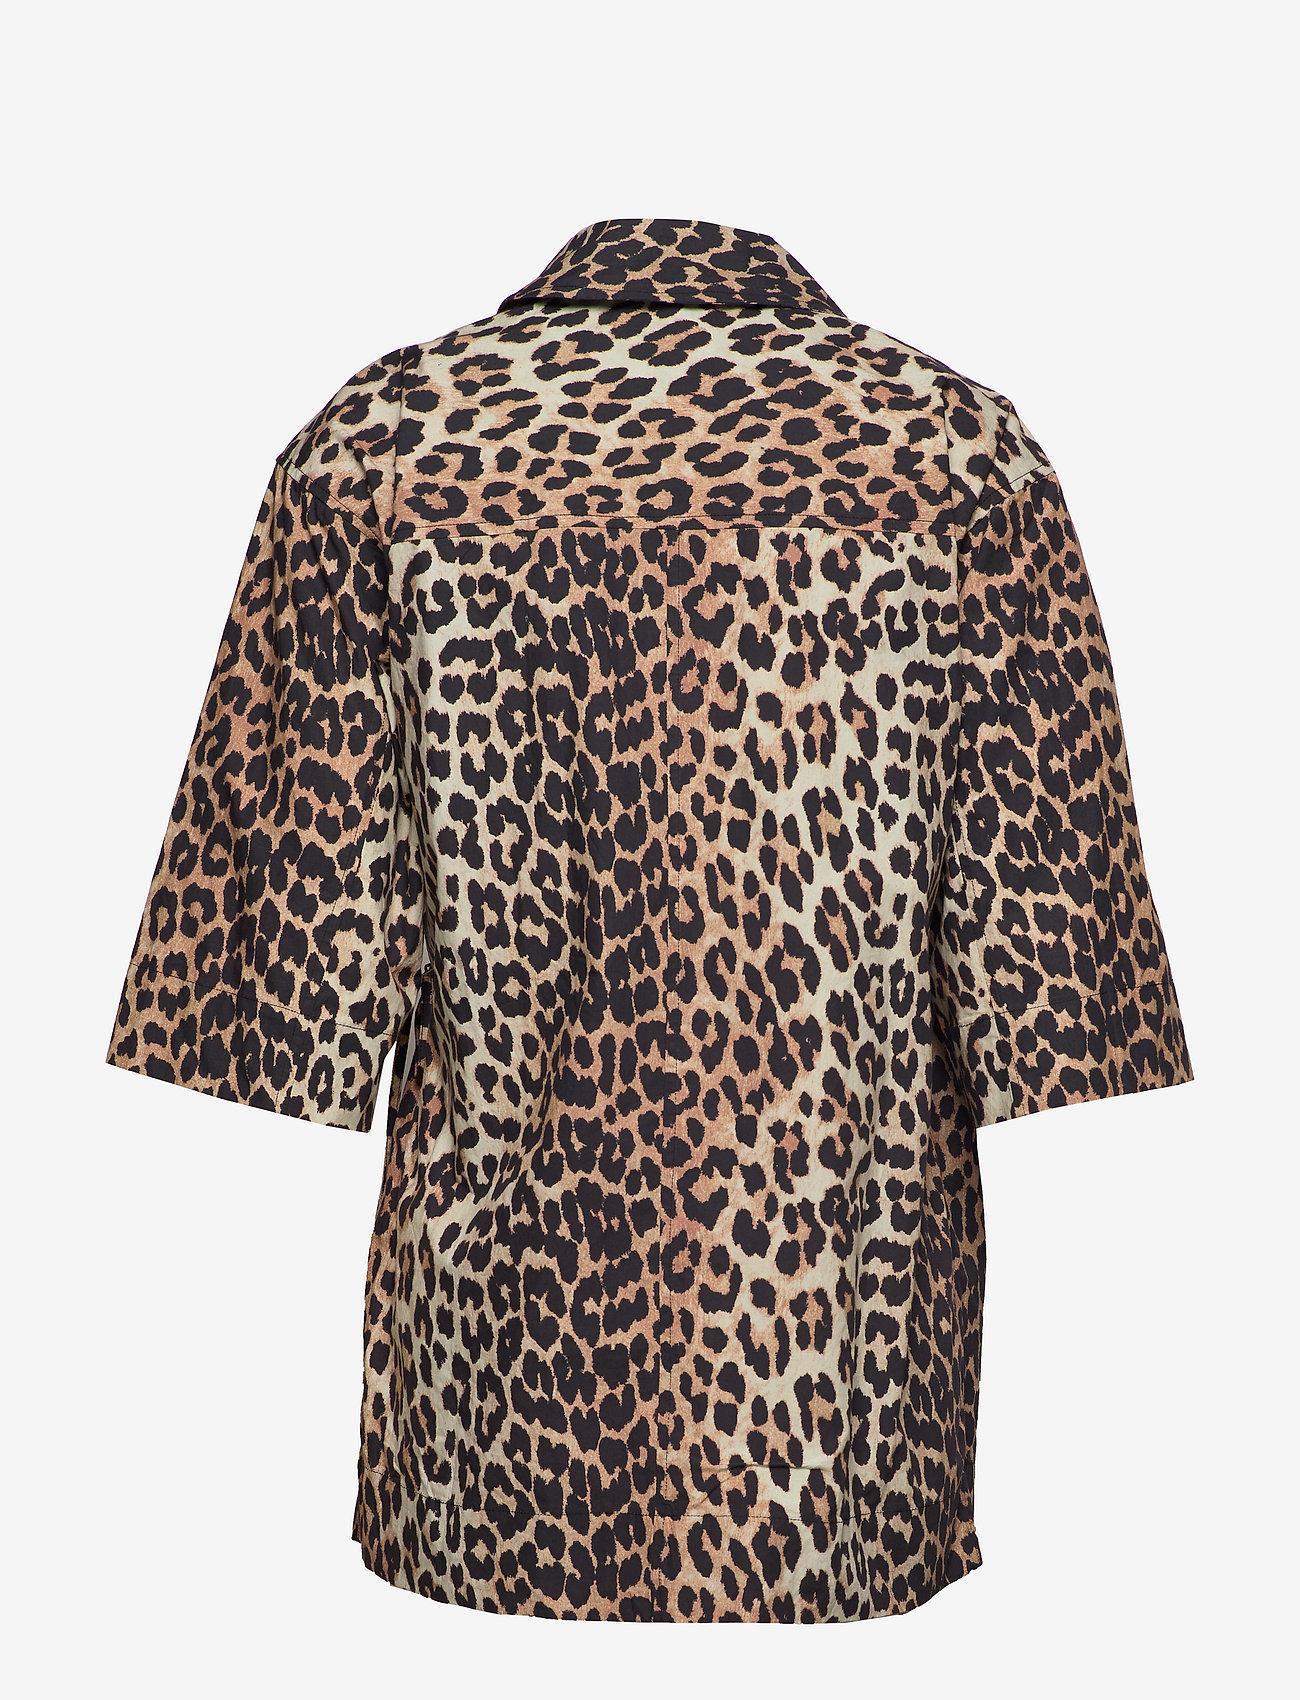 Ganni - Printed Cotton Poplin - overhemden met korte mouwen - leopard - 1